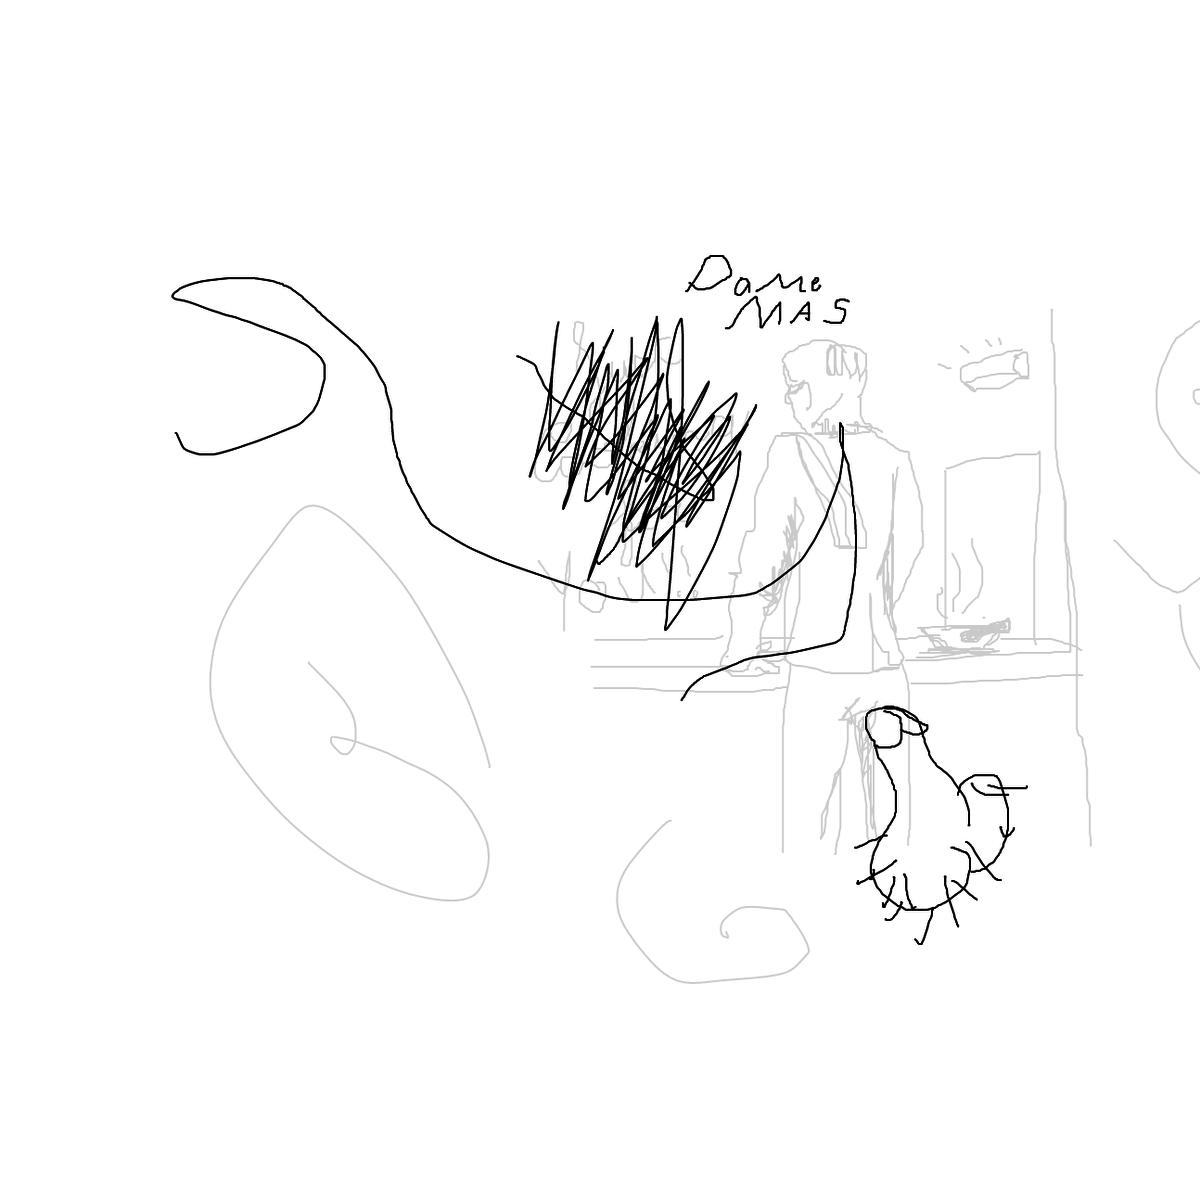 BAAAM drawing#18607 lat:48.8558120727539060lng: 2.3673558235168457